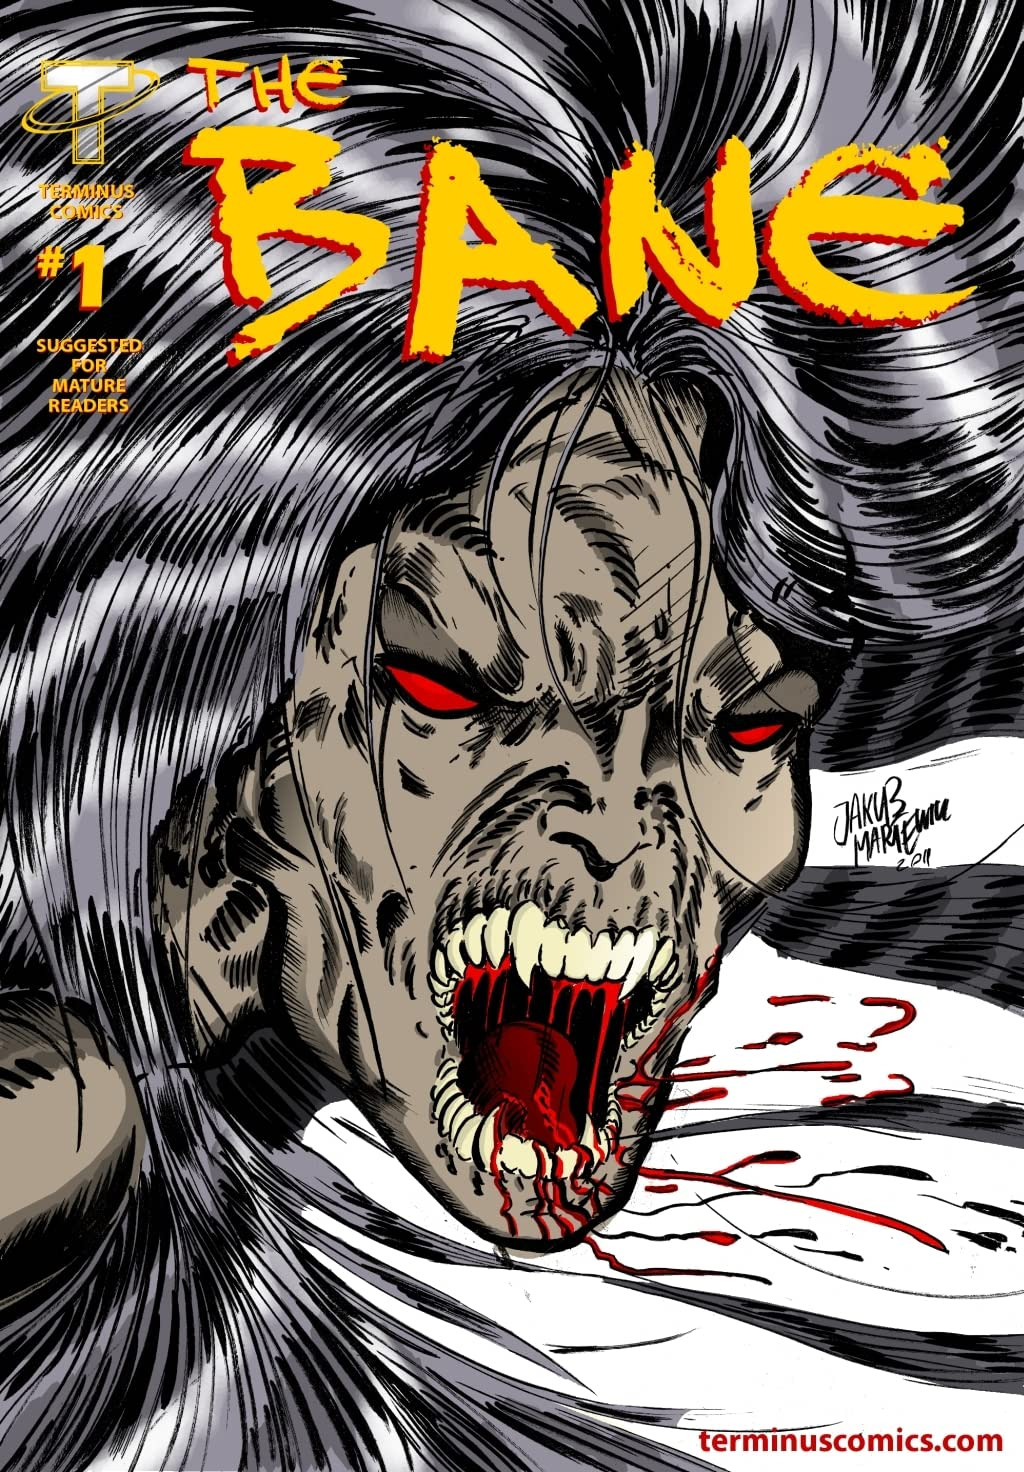 The Bane #1